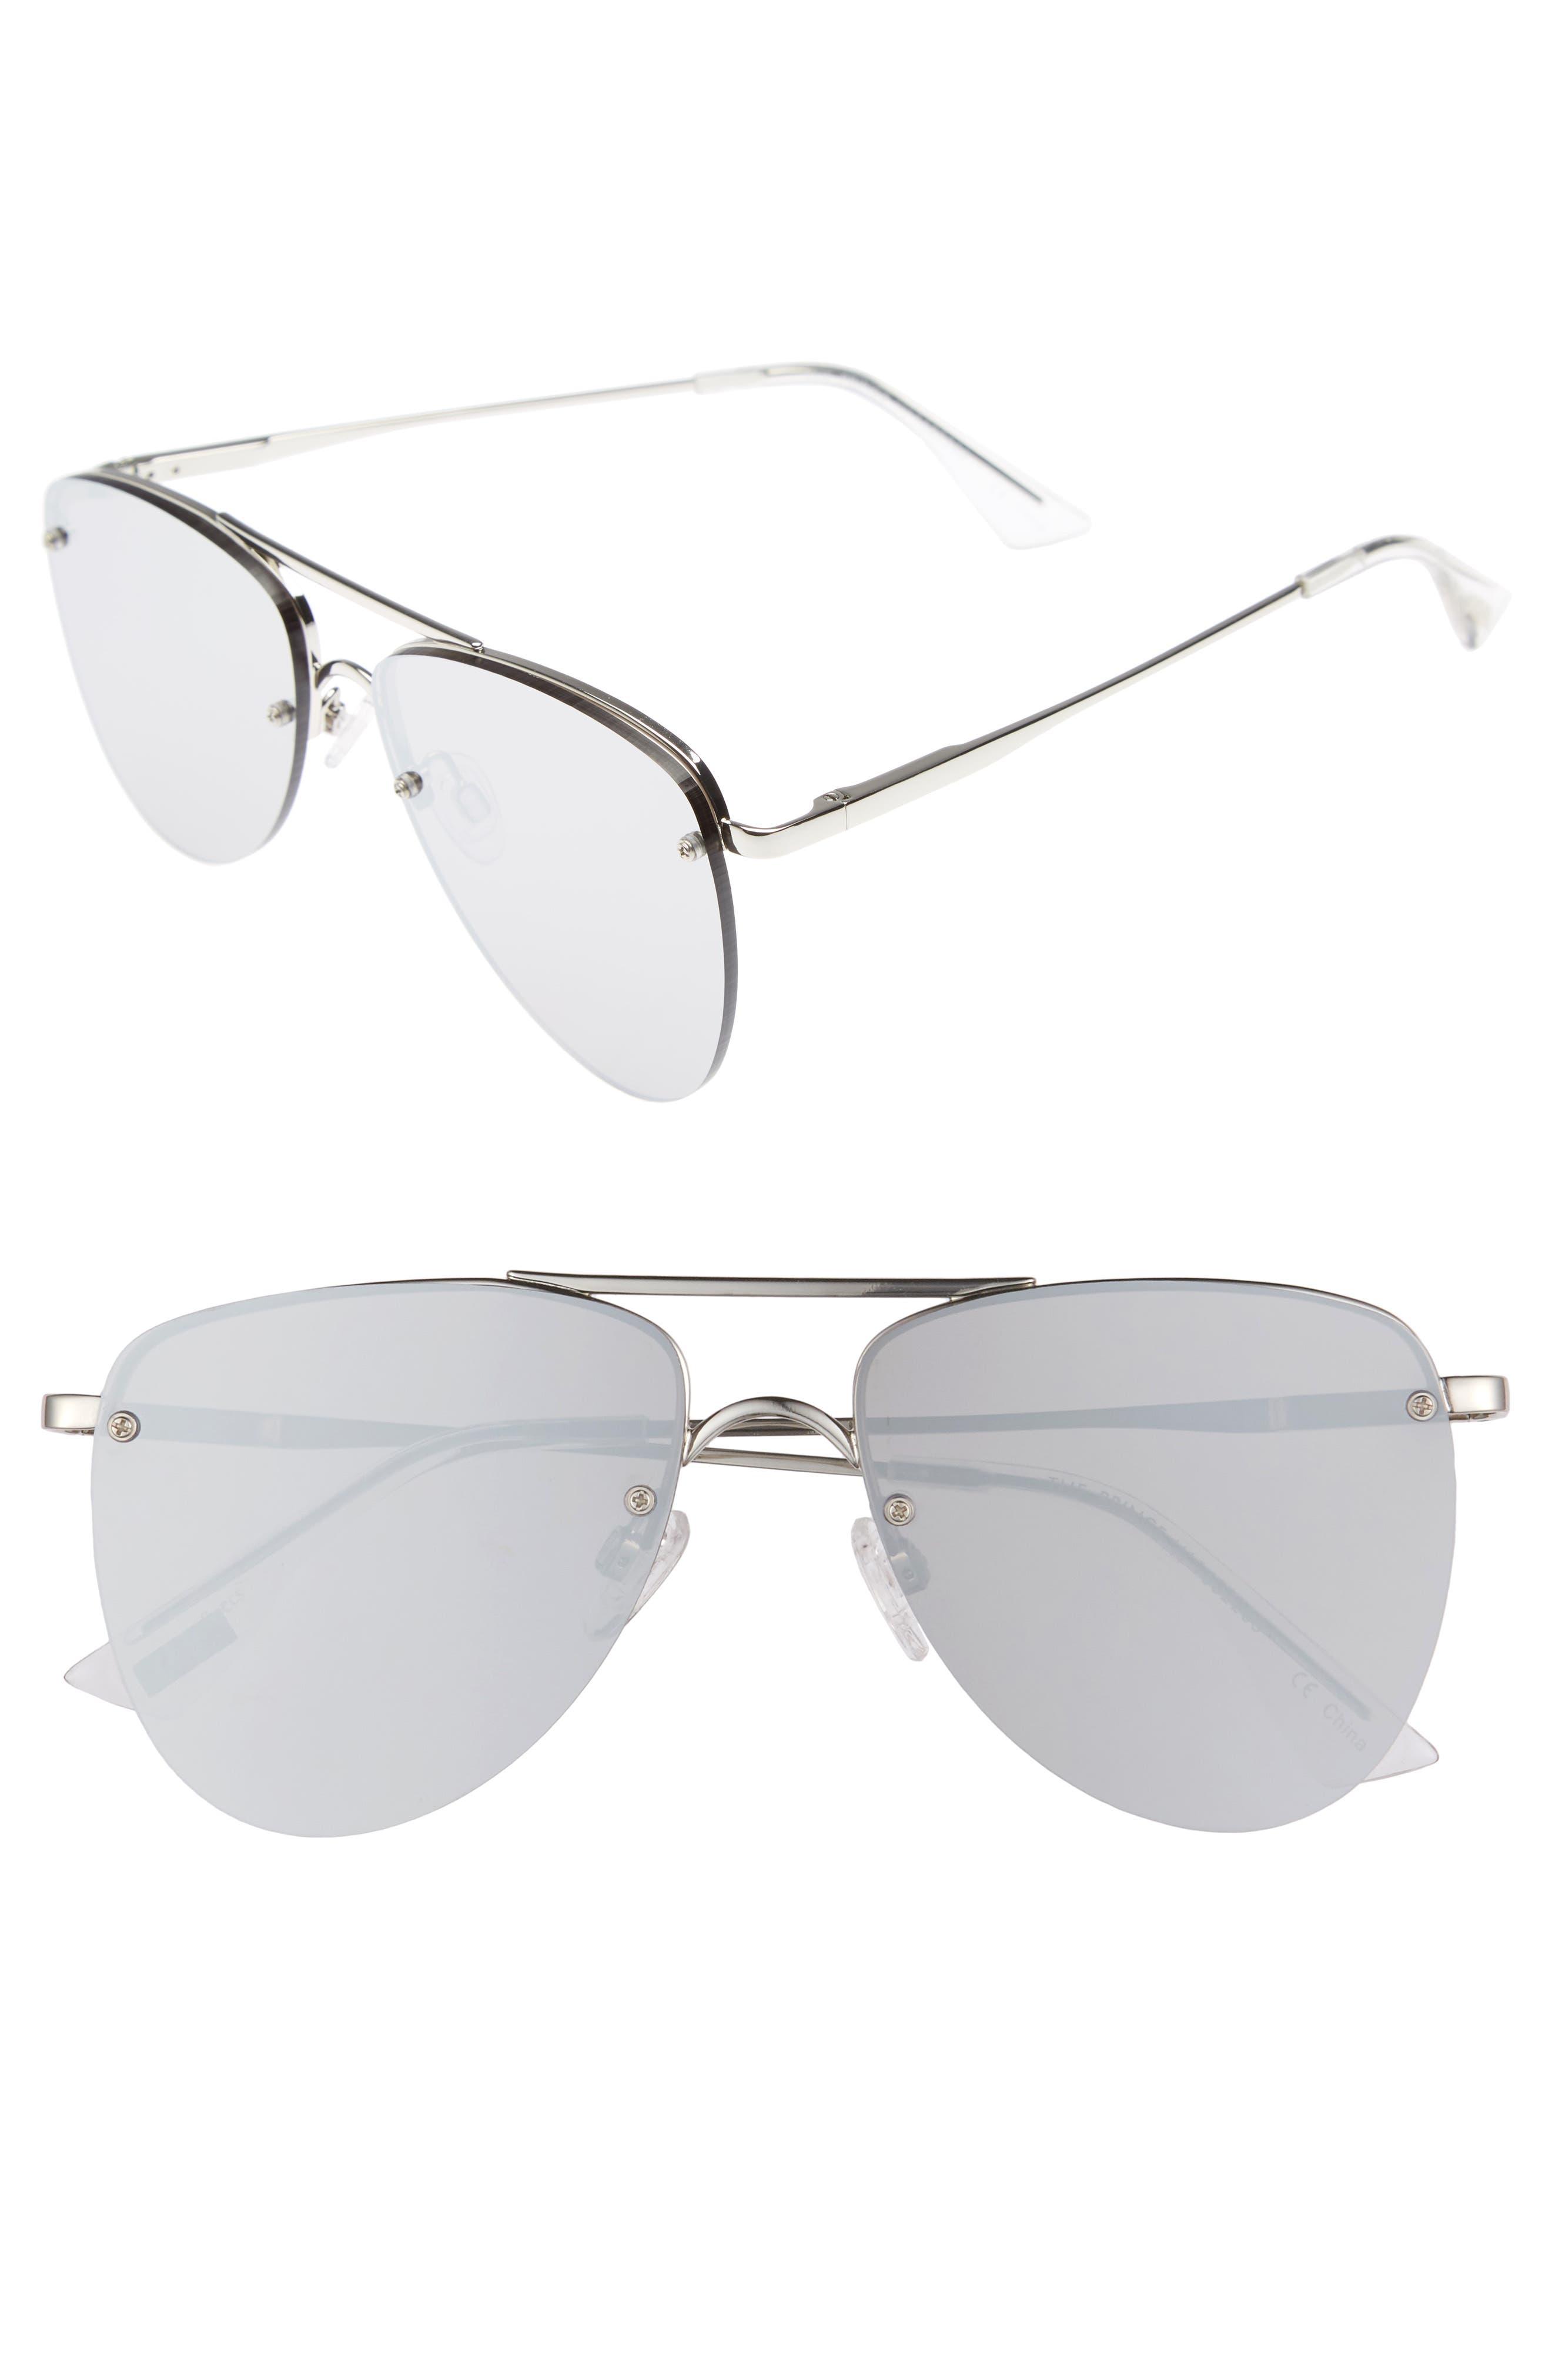 The Prince 57mm Aviator Sunglasses,                             Main thumbnail 1, color,                             040